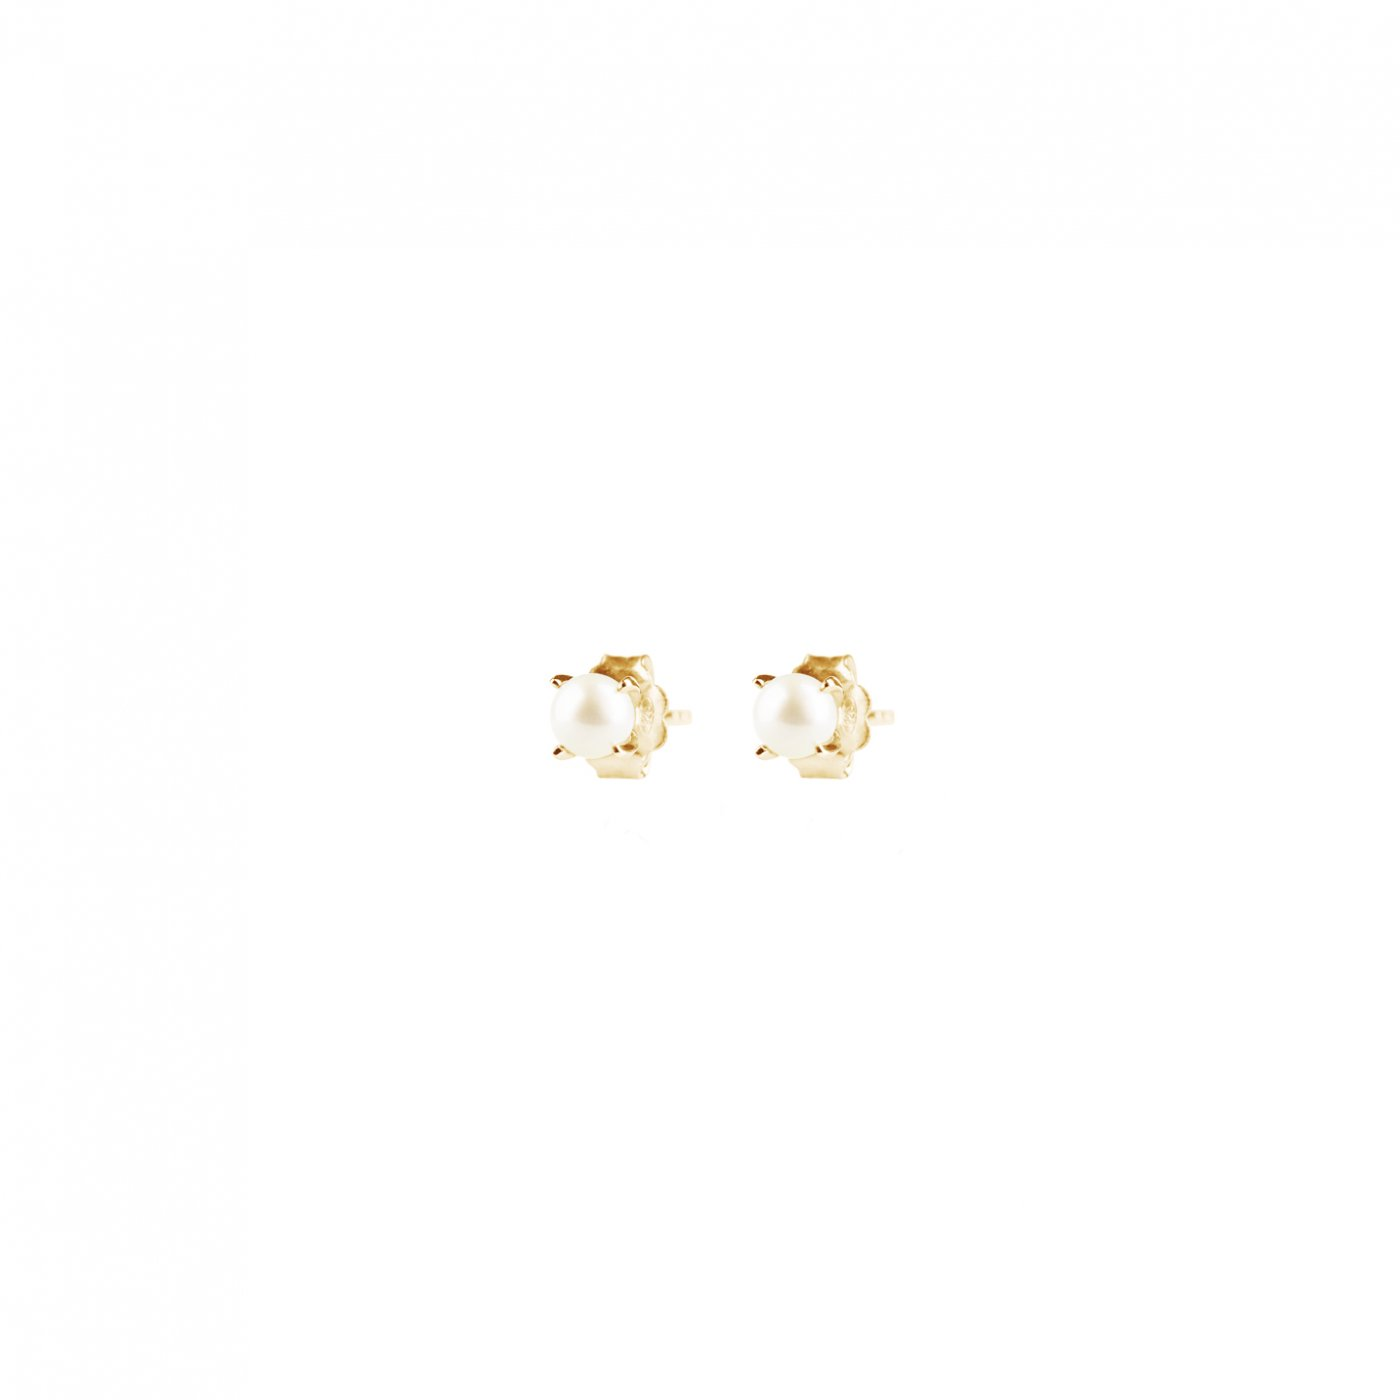 petite-pearl-studs-gold-1400x1400